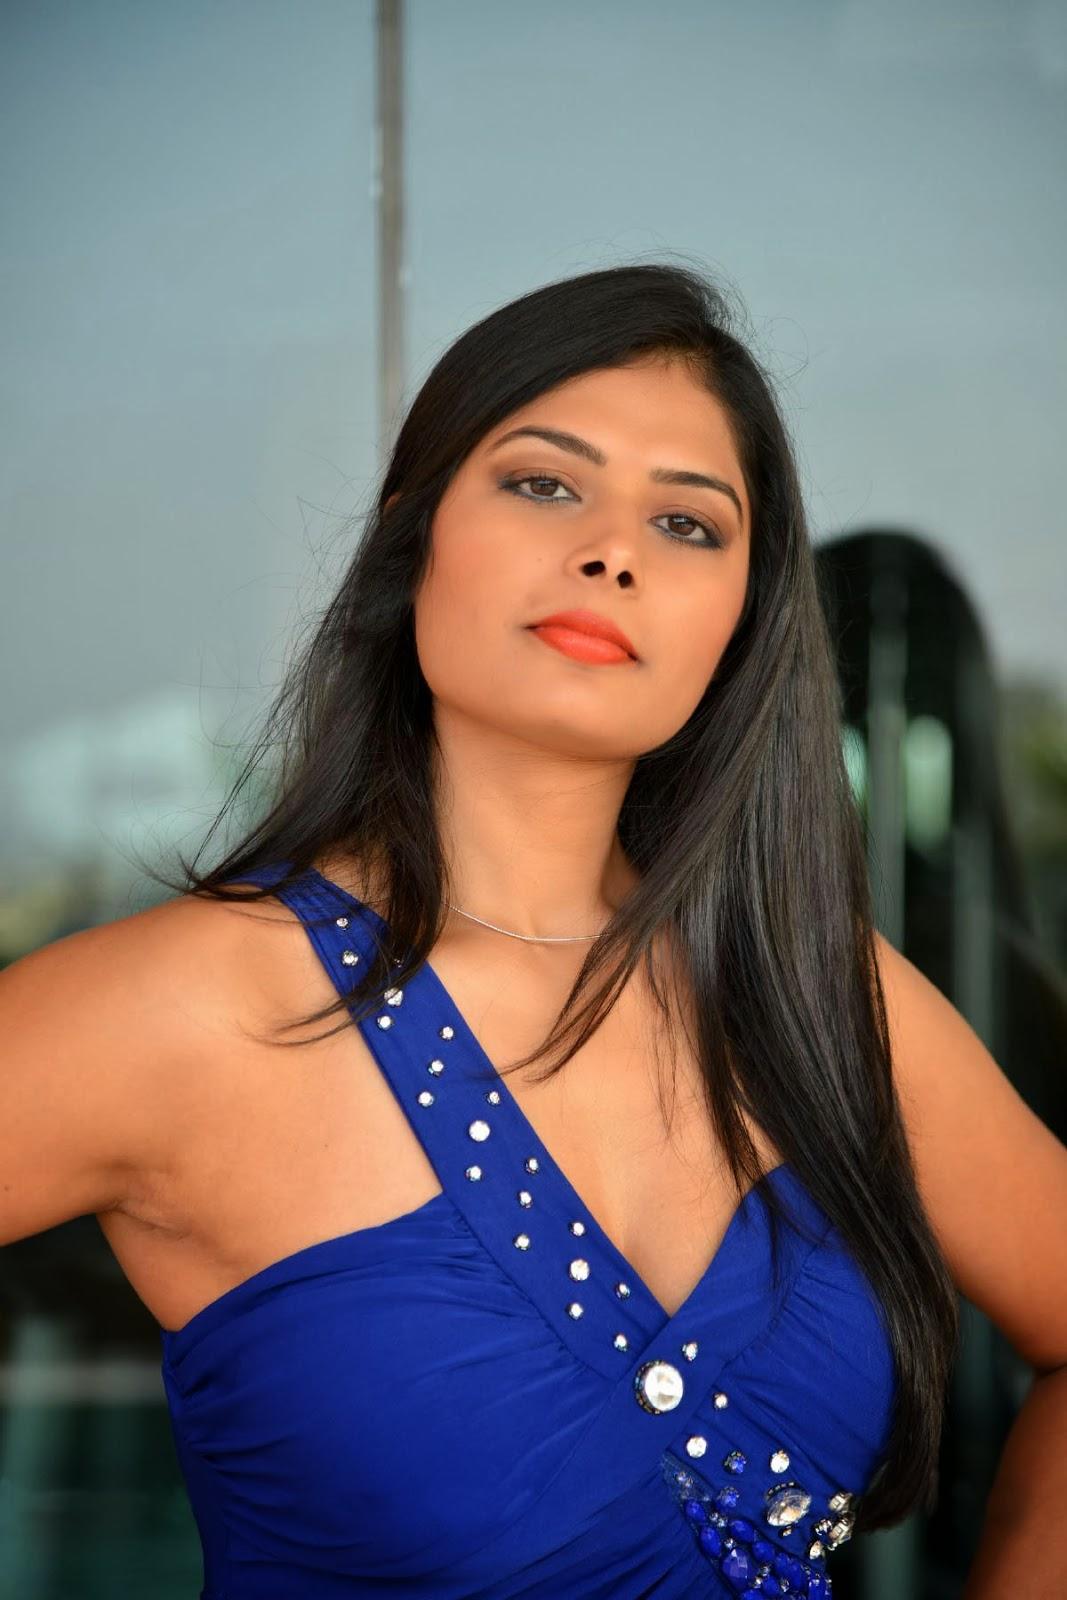 1 bangla bhabhi show big boobs n pussy - 5 8